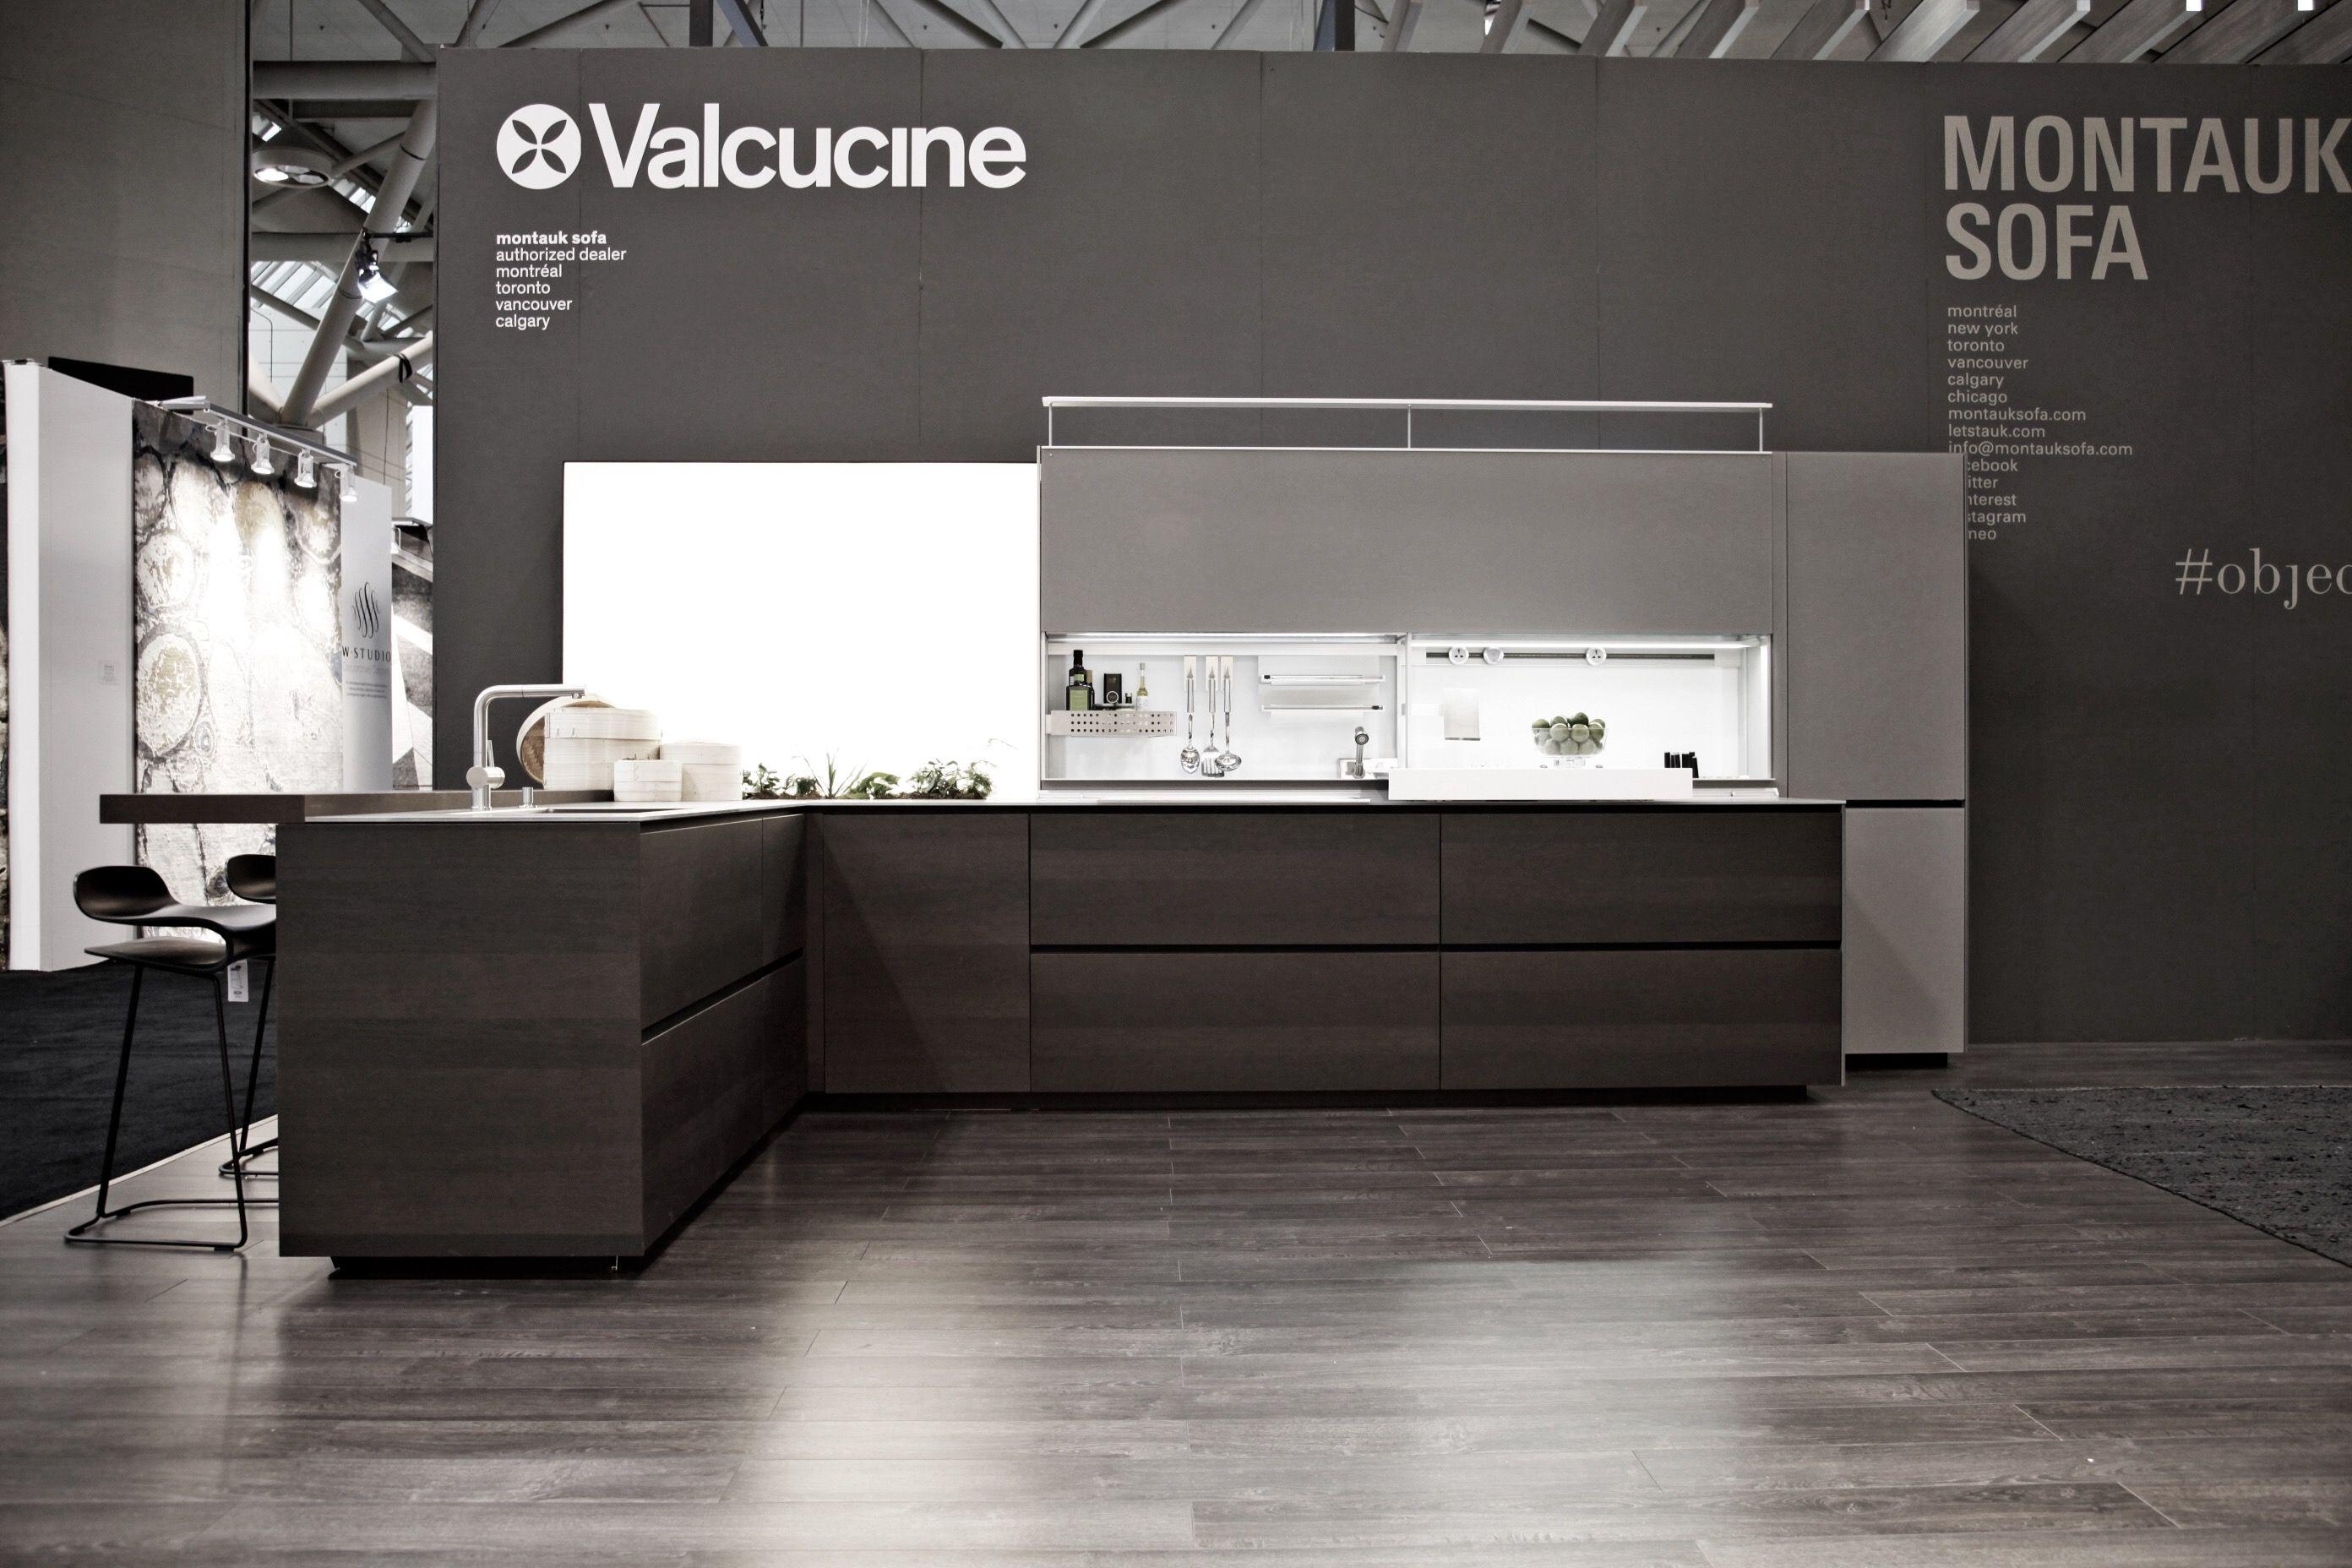 Montauk Sofa Introduces Kitchens By Valcucine Idstoronto